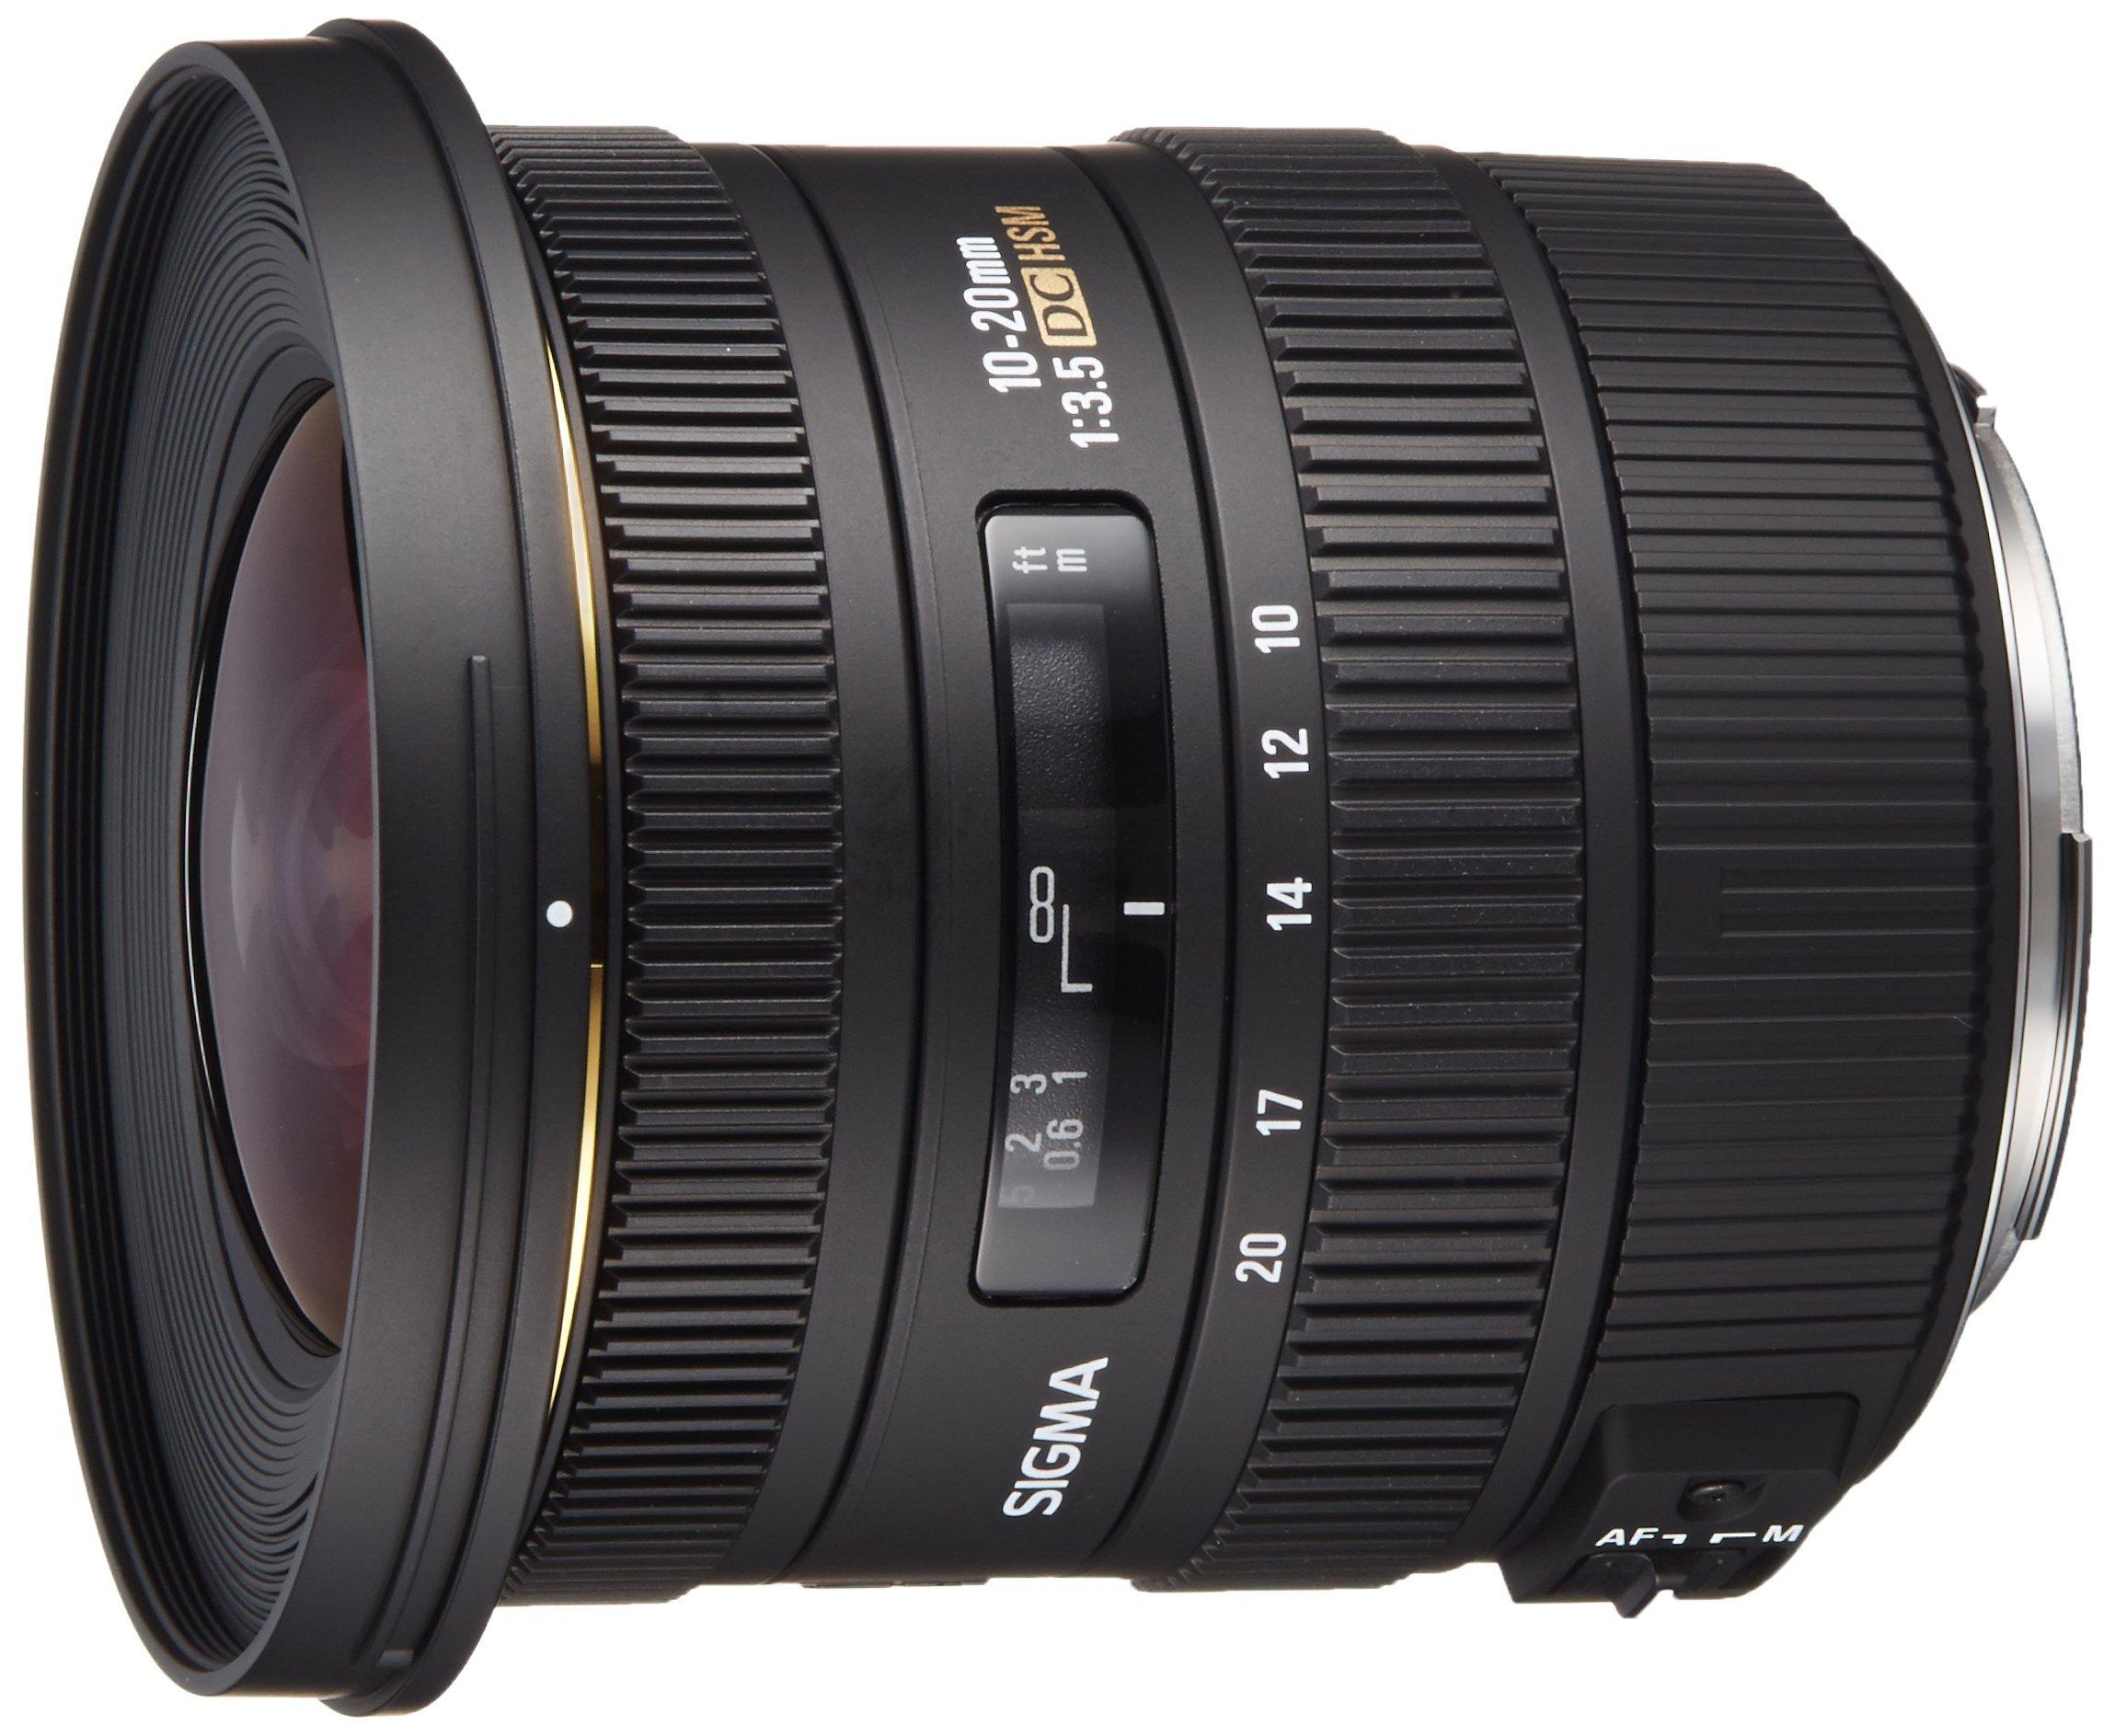 Sigma 10-20mm f/3.5 EX DC HSM ELD SLD Aspherical Super Wide Angle Lens for Canon Digital SLR Cameras by Sigma